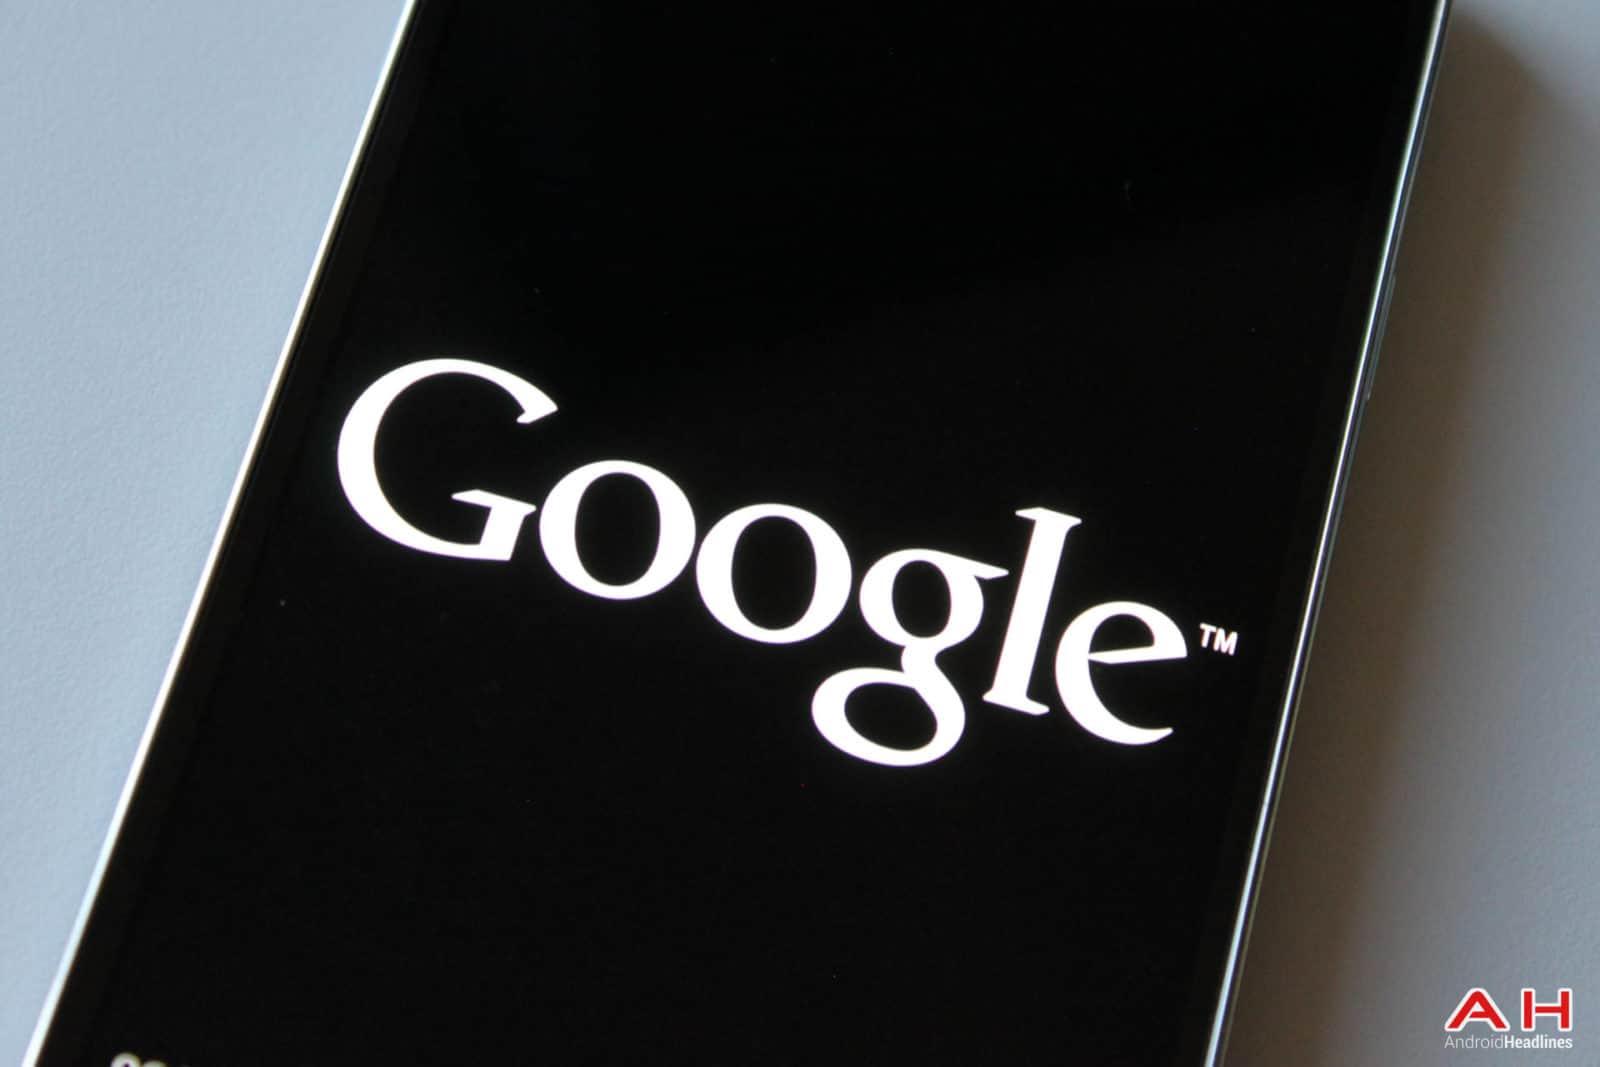 AH Google Logo Black 1.3